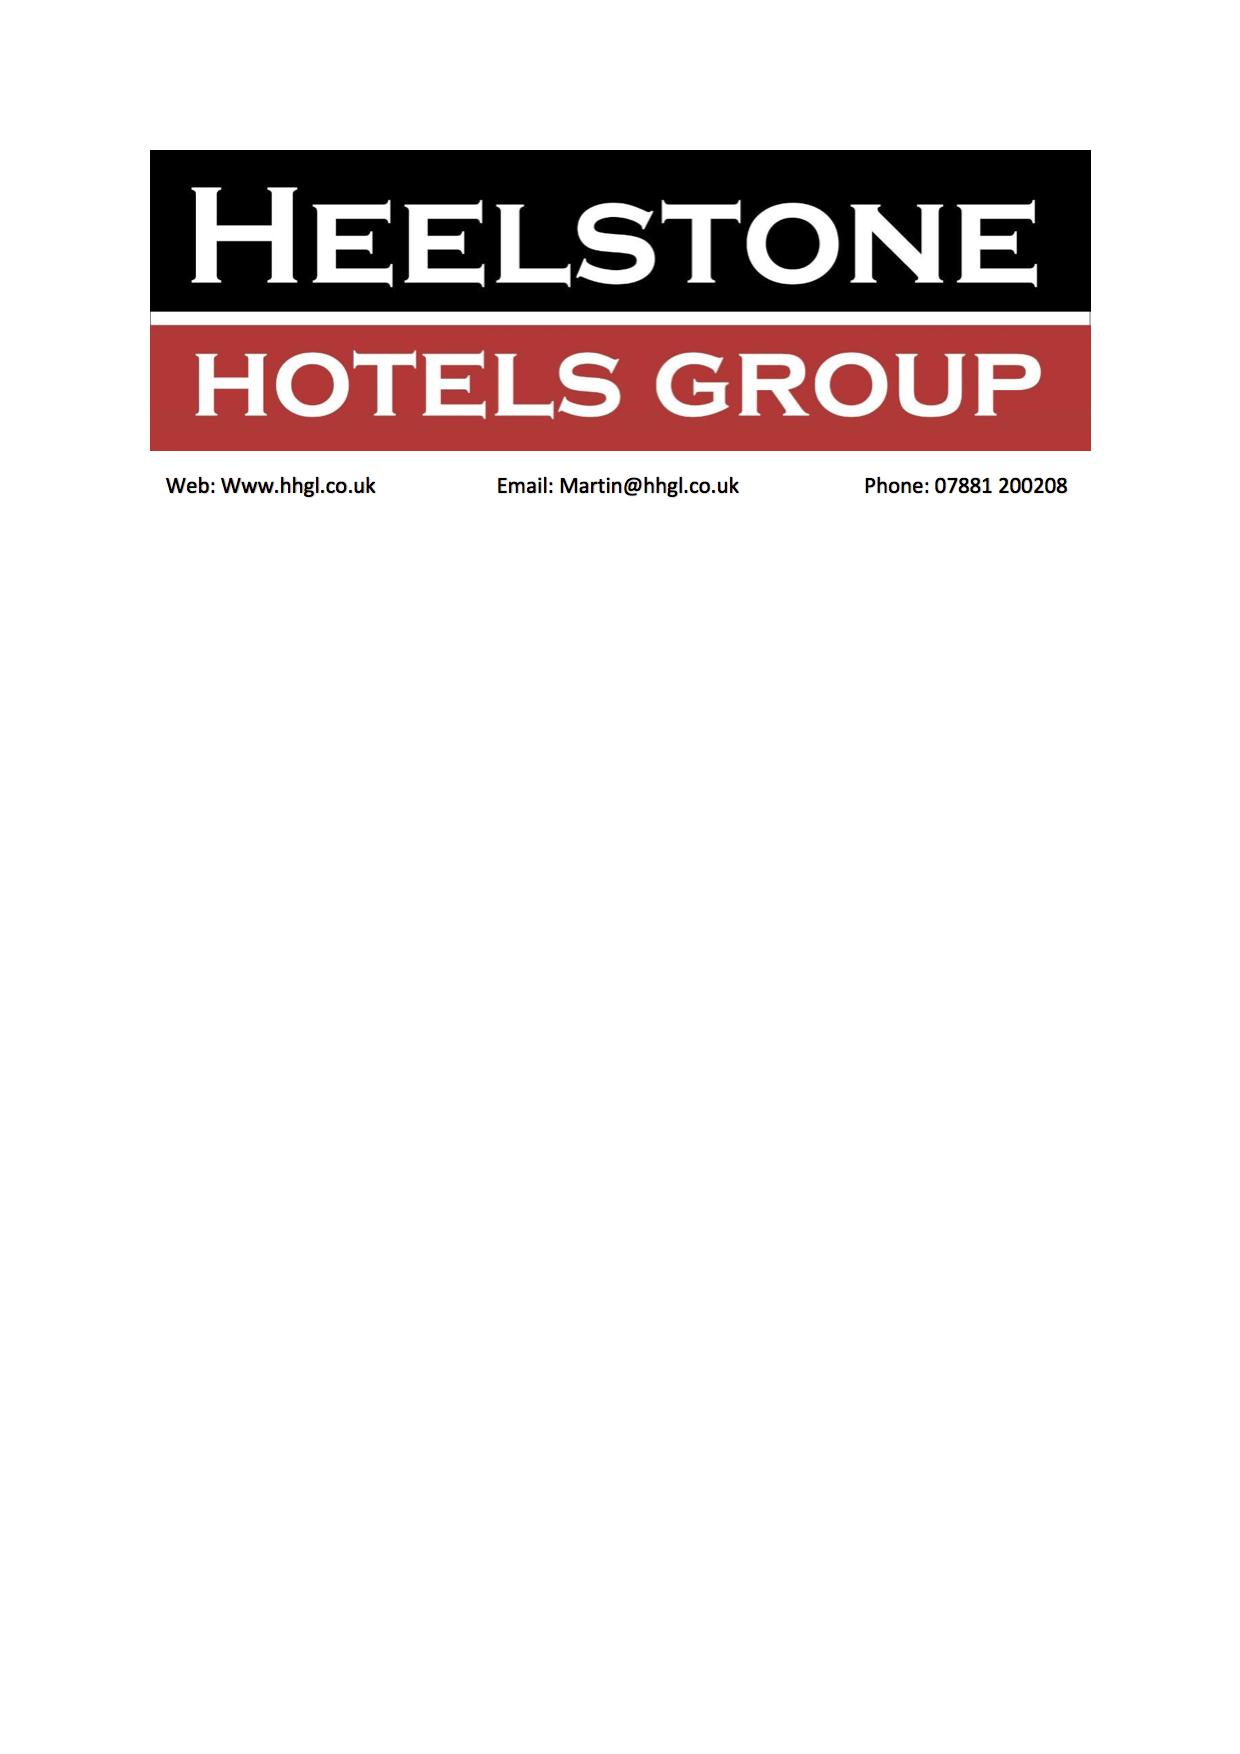 Heelstone Hotels Group